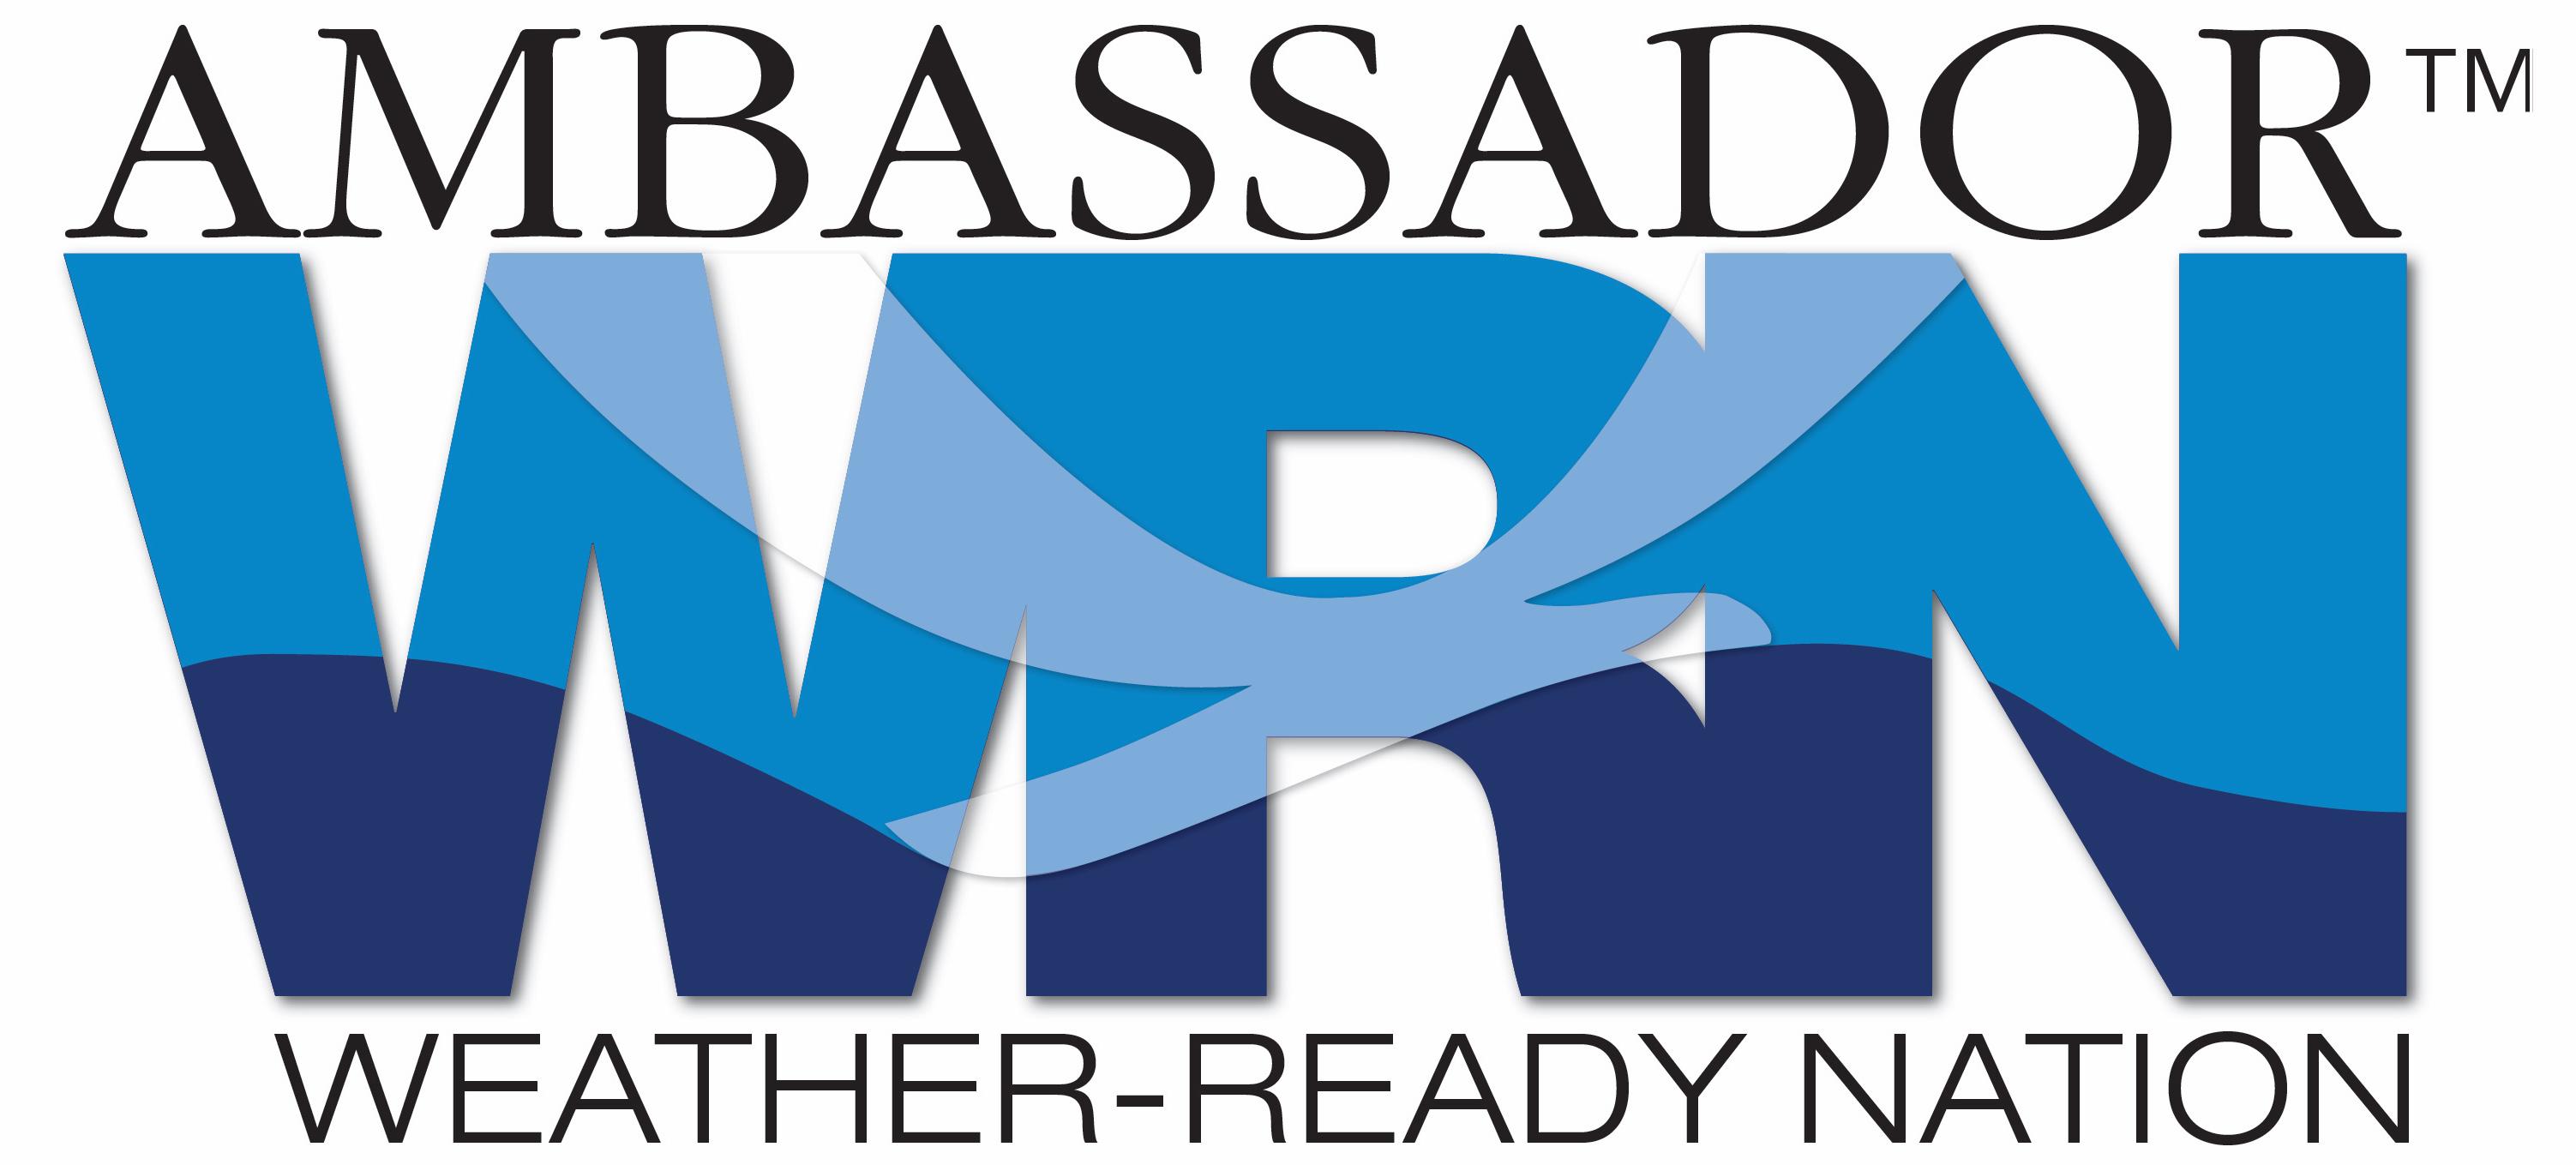 Ambassador_badge_3bWRN_logo